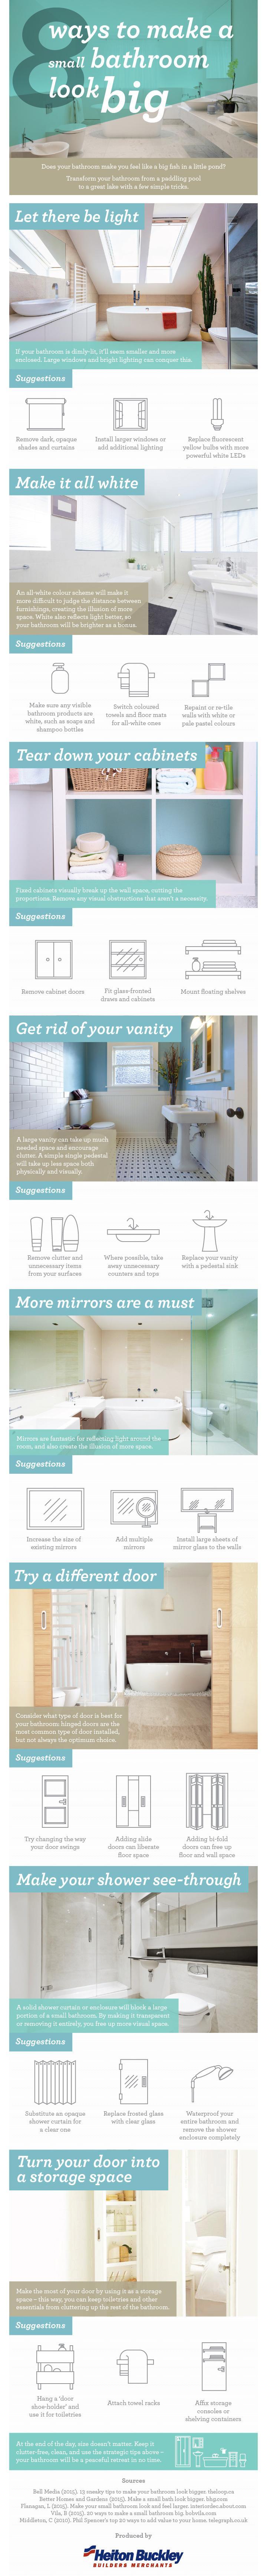 8-ways-to-make-a-small-bathroom-look-bigger